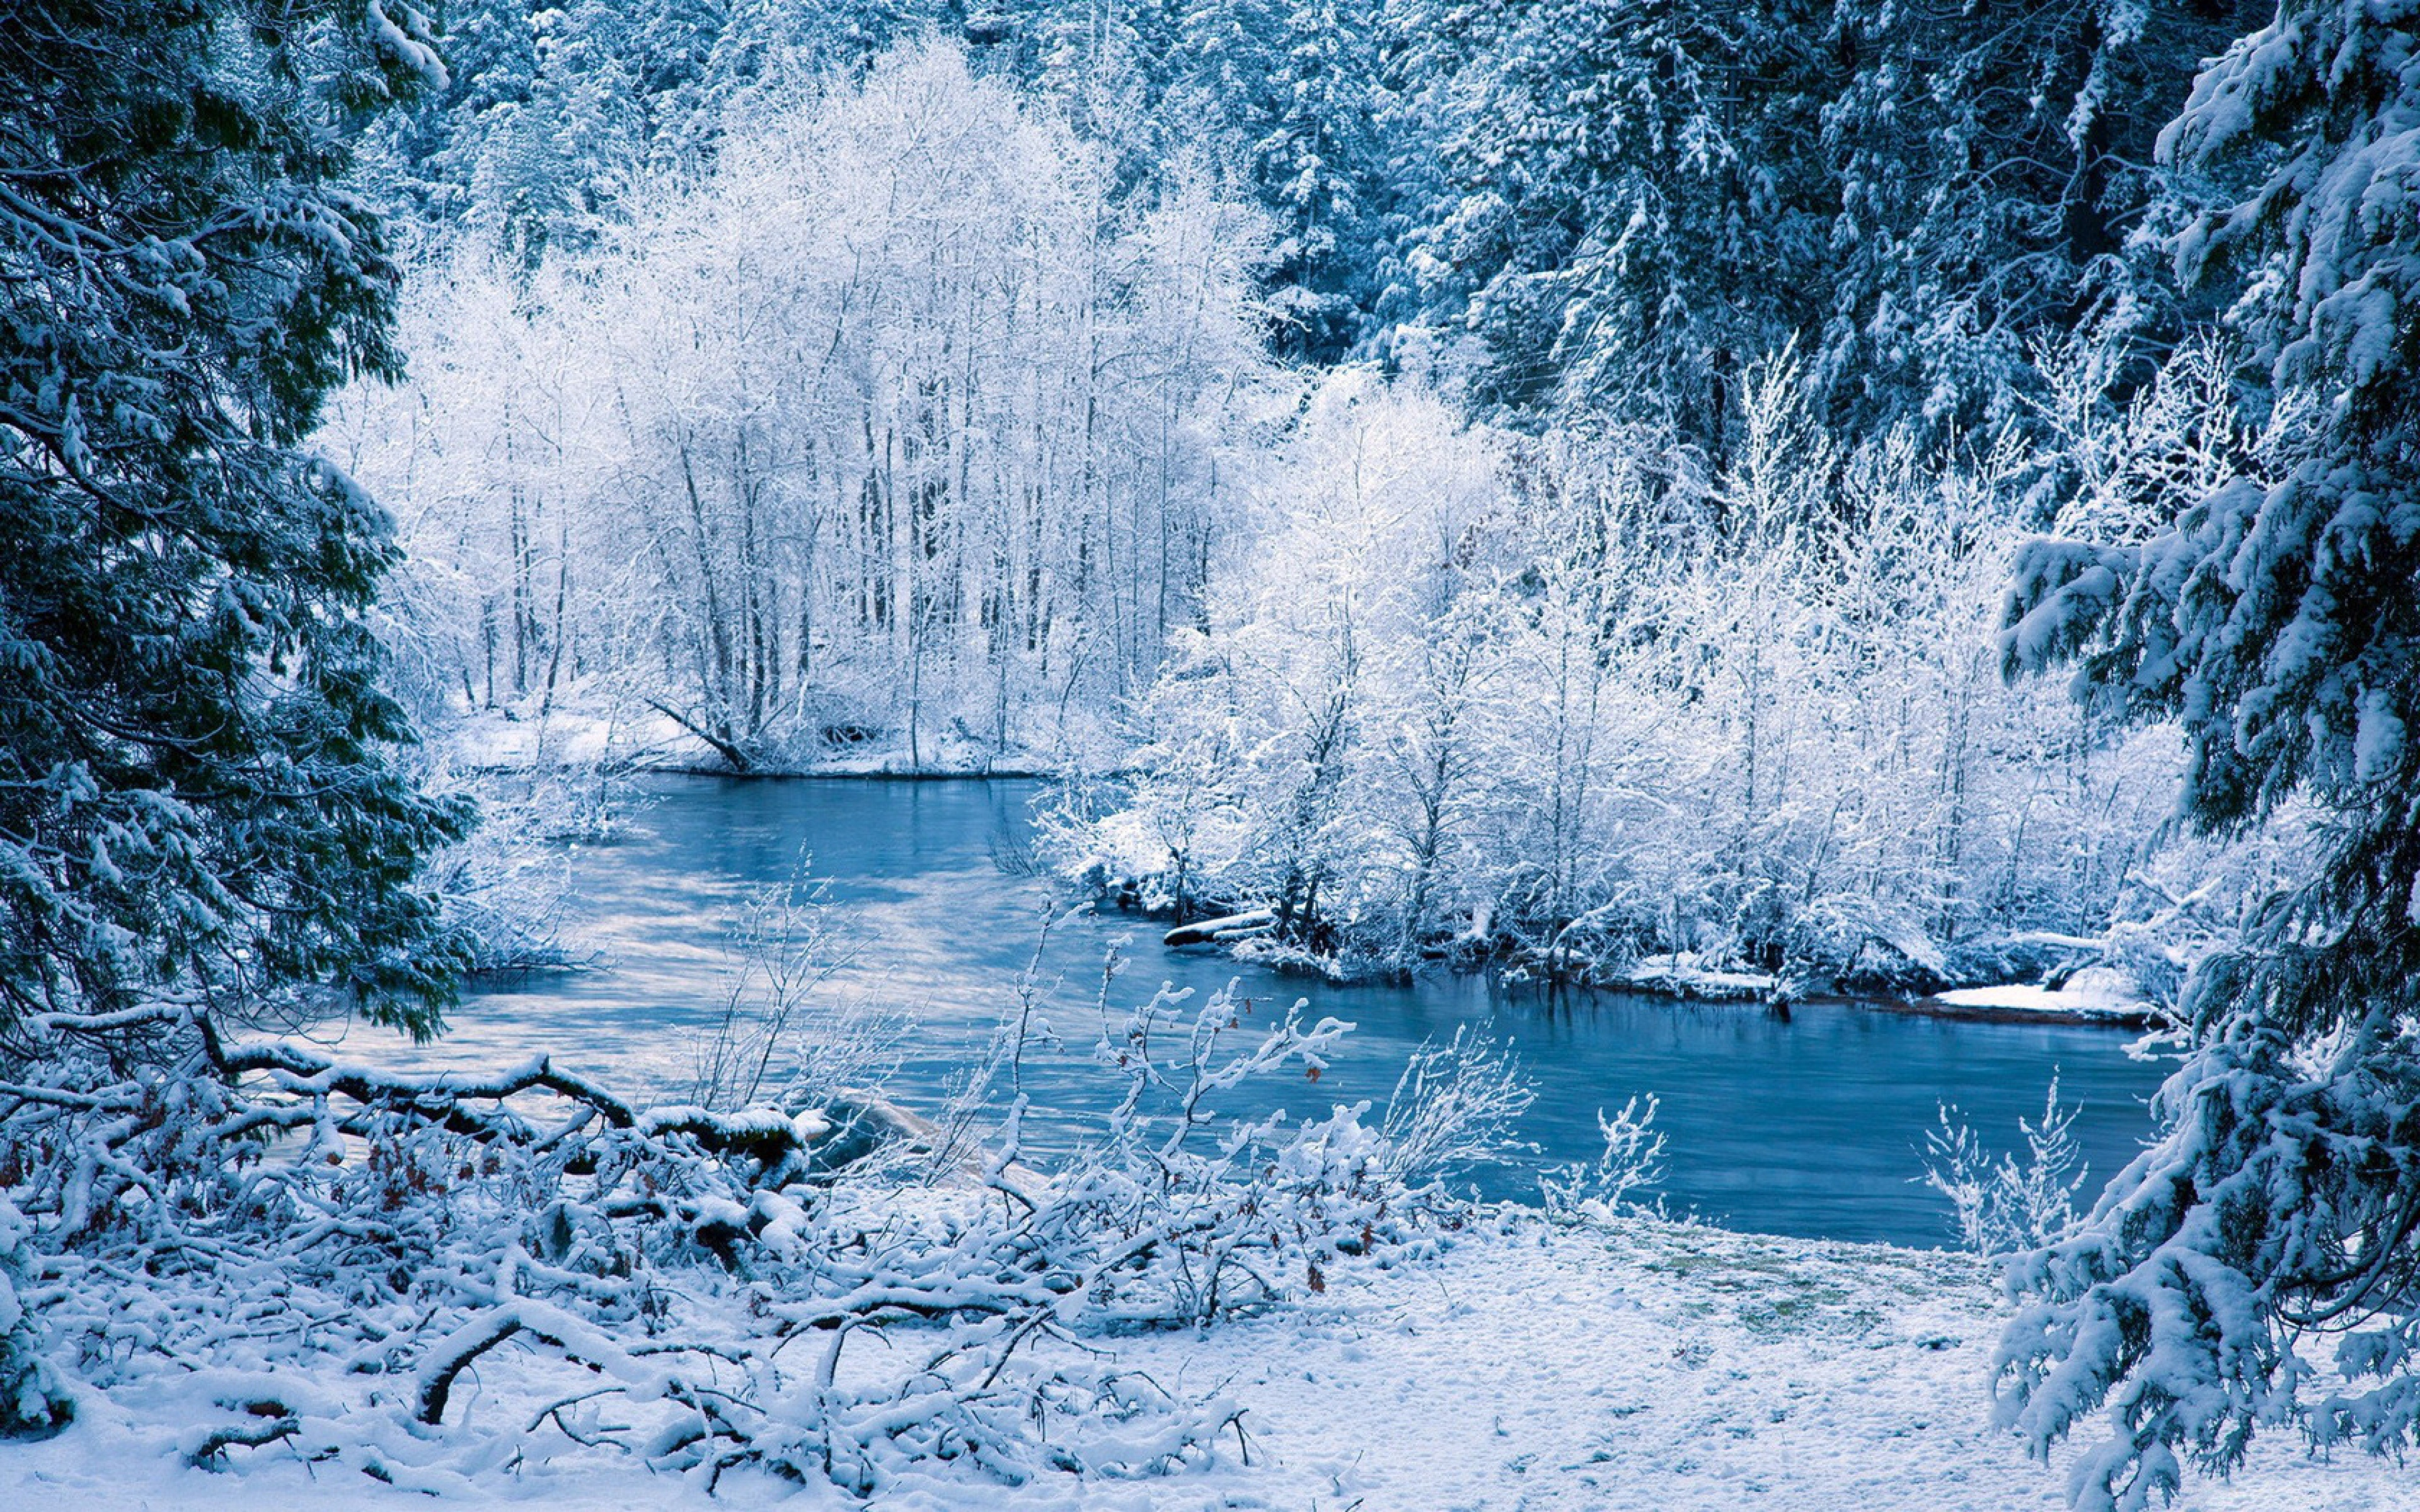 Wallpaper 3840x2400 Winter River Snow Trees Landscape Ultra HD 4K 3840x2400